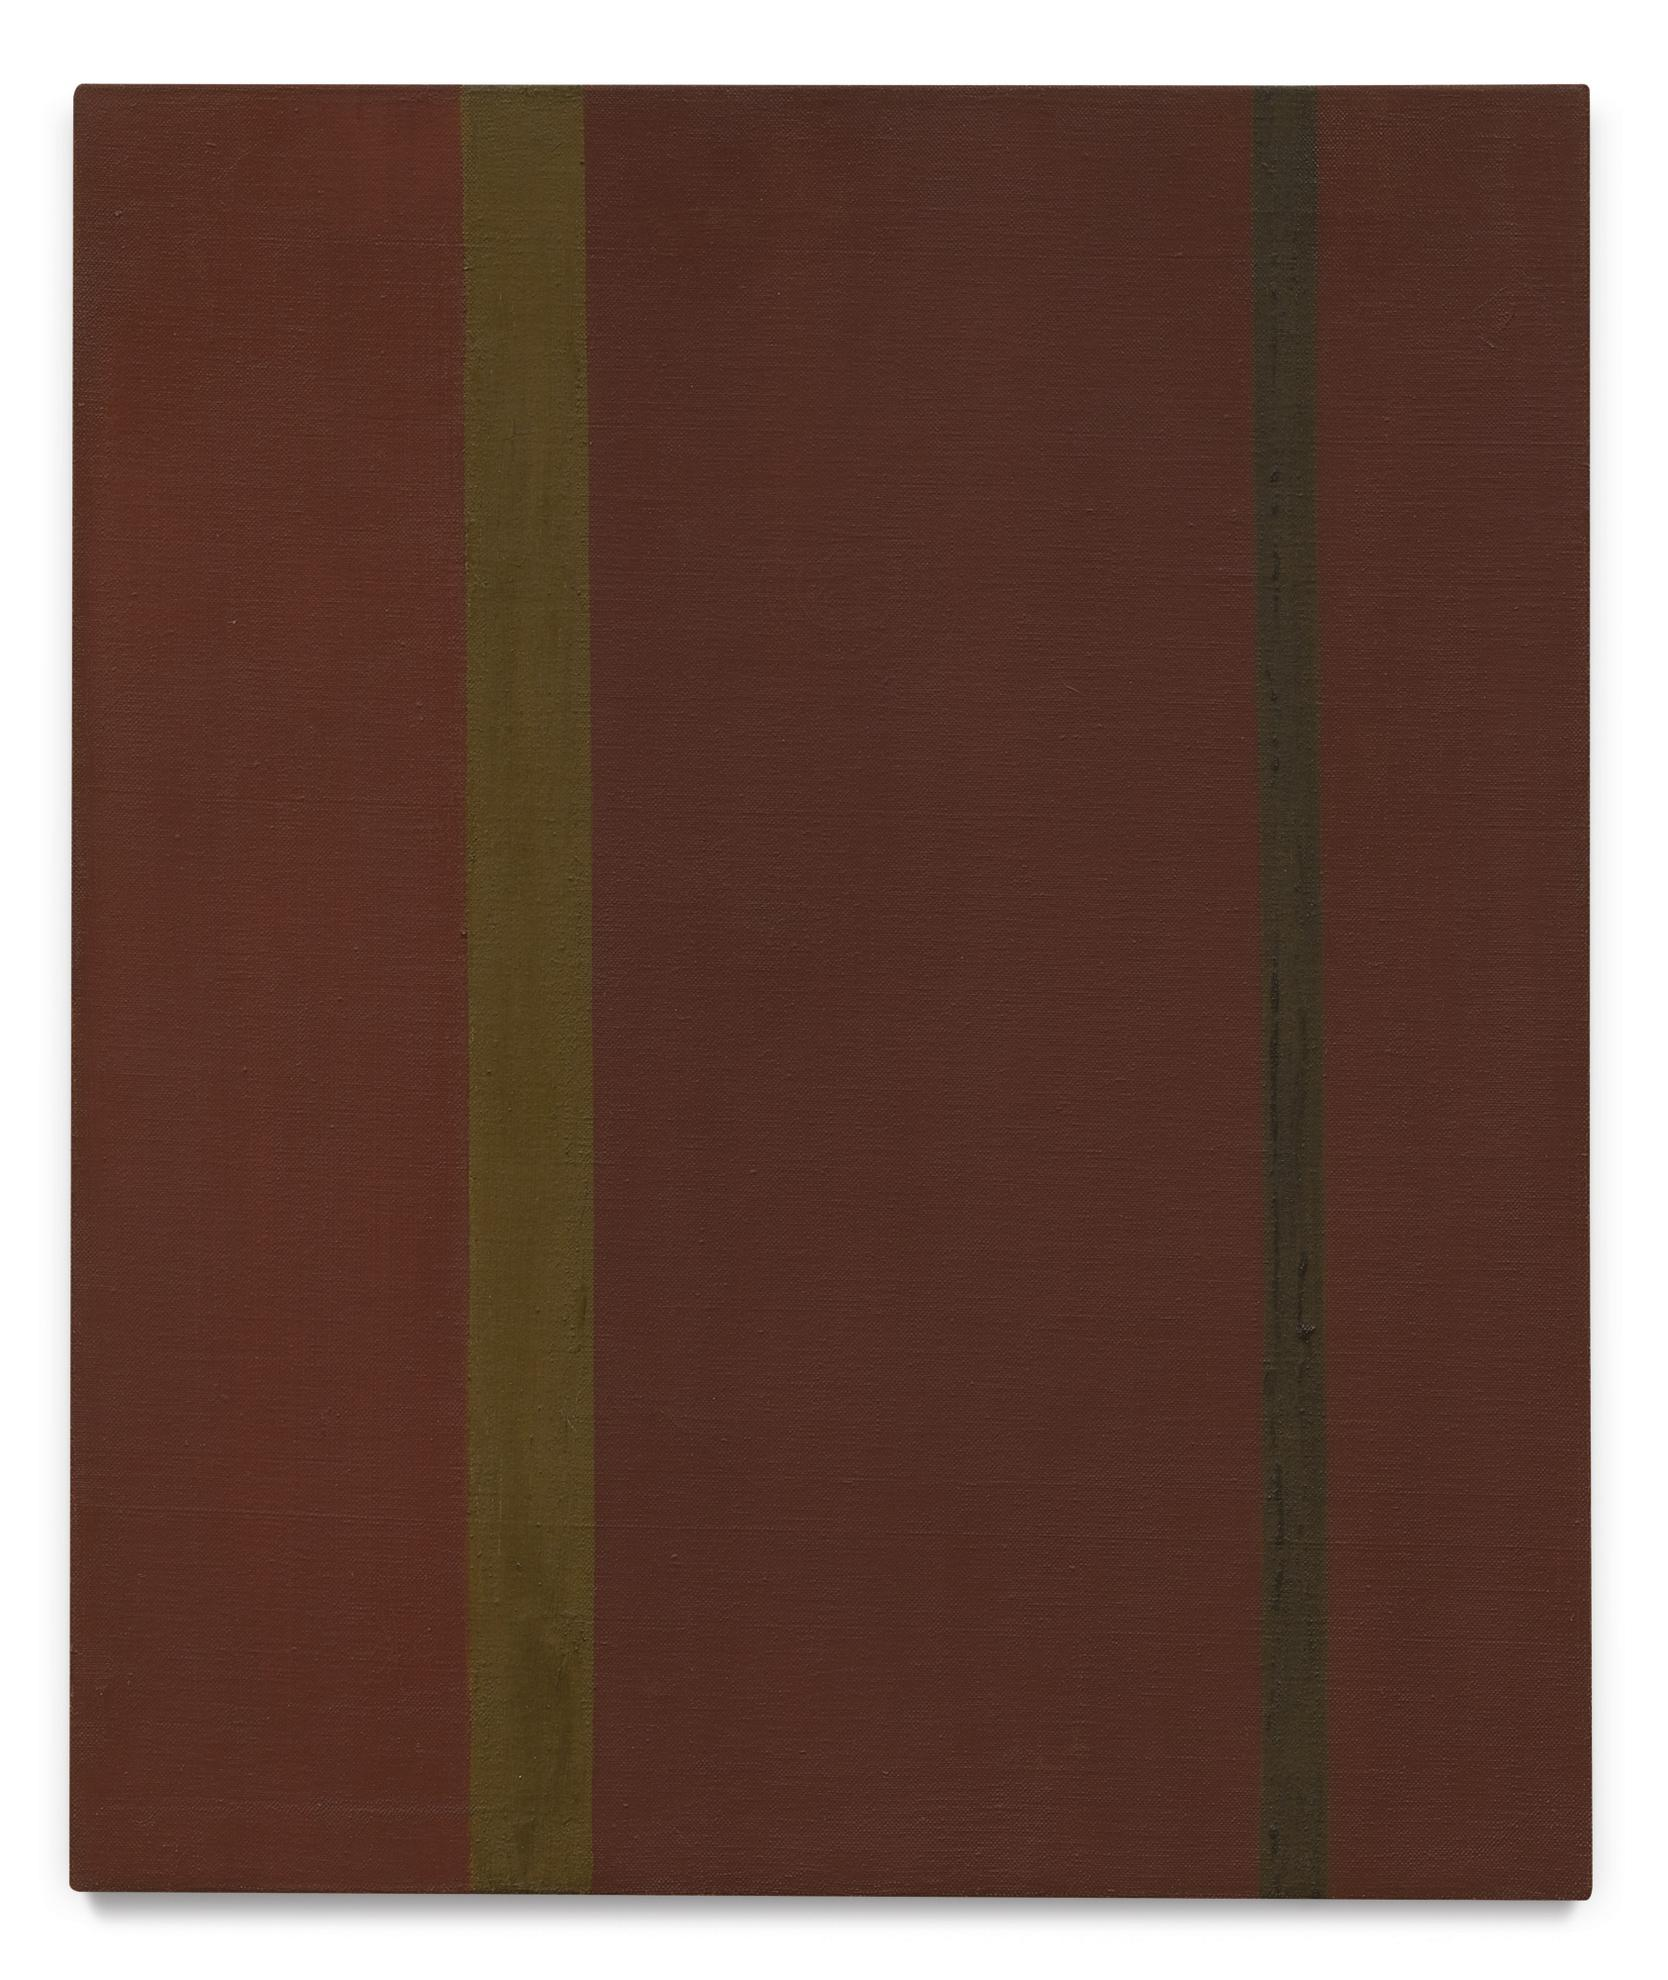 Barnett Newman-Galaxy-1949